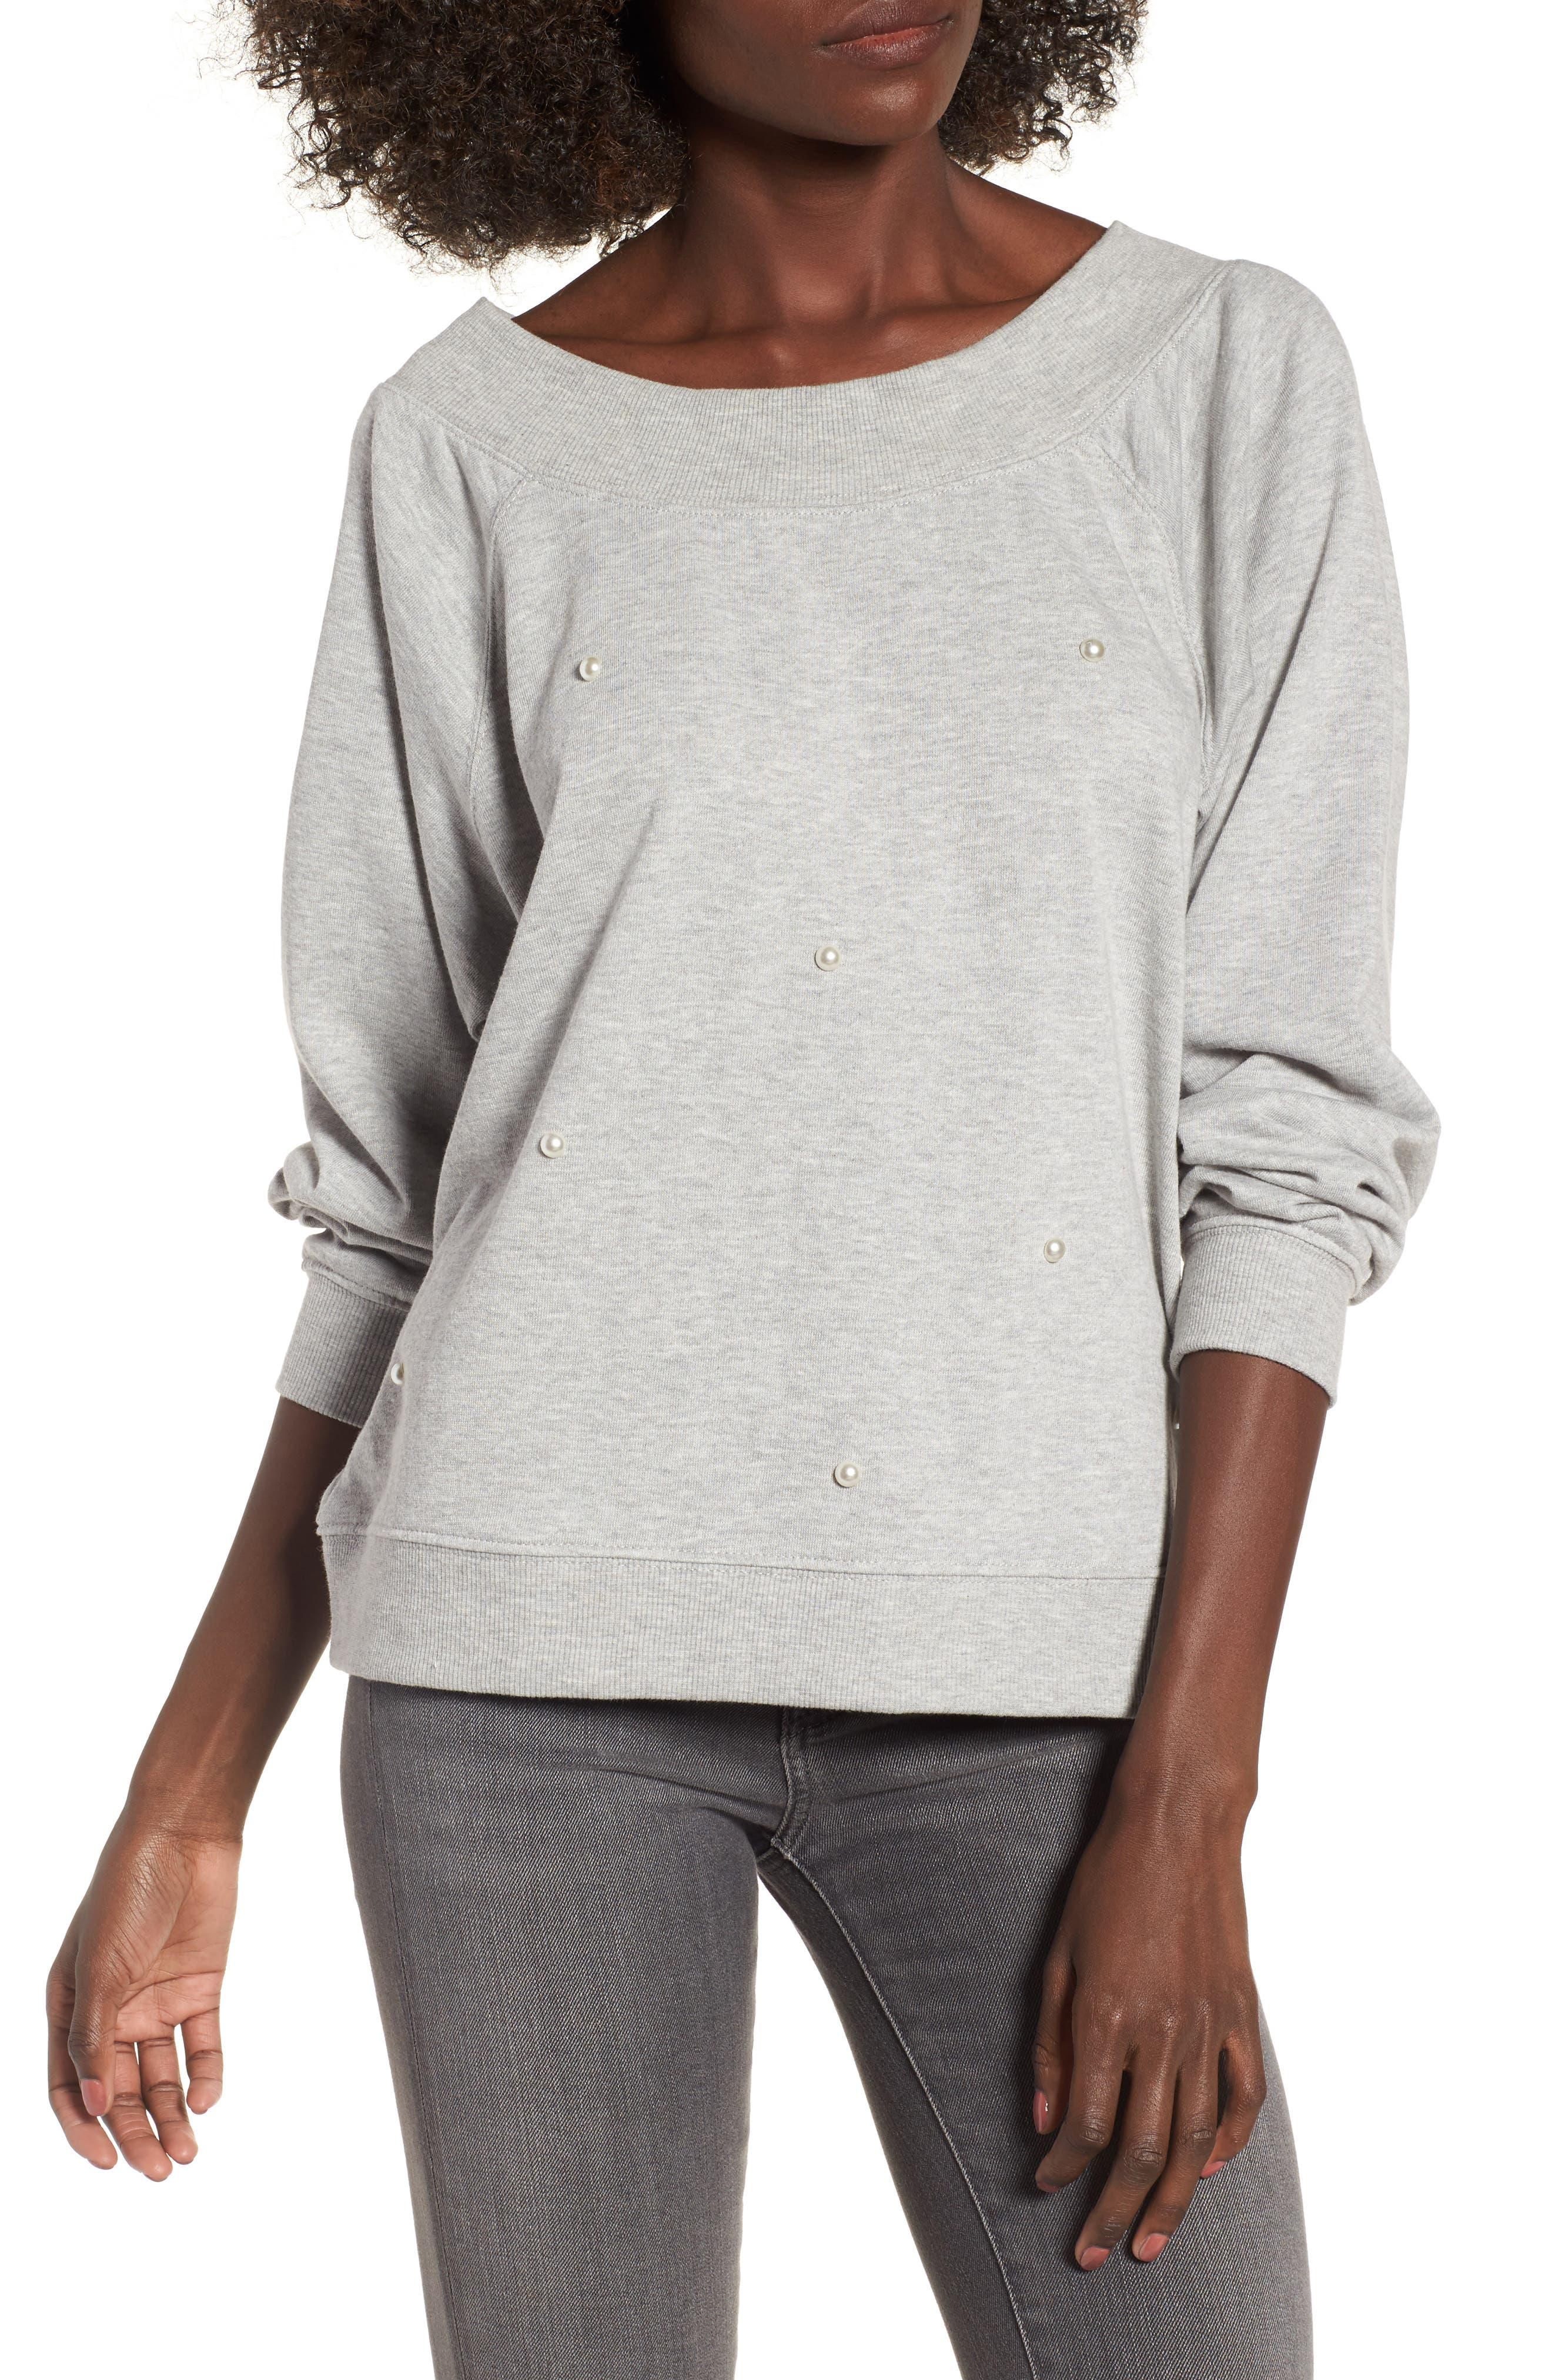 Embellished Off the Shoulder Sweatshirt,                             Main thumbnail 1, color,                             020